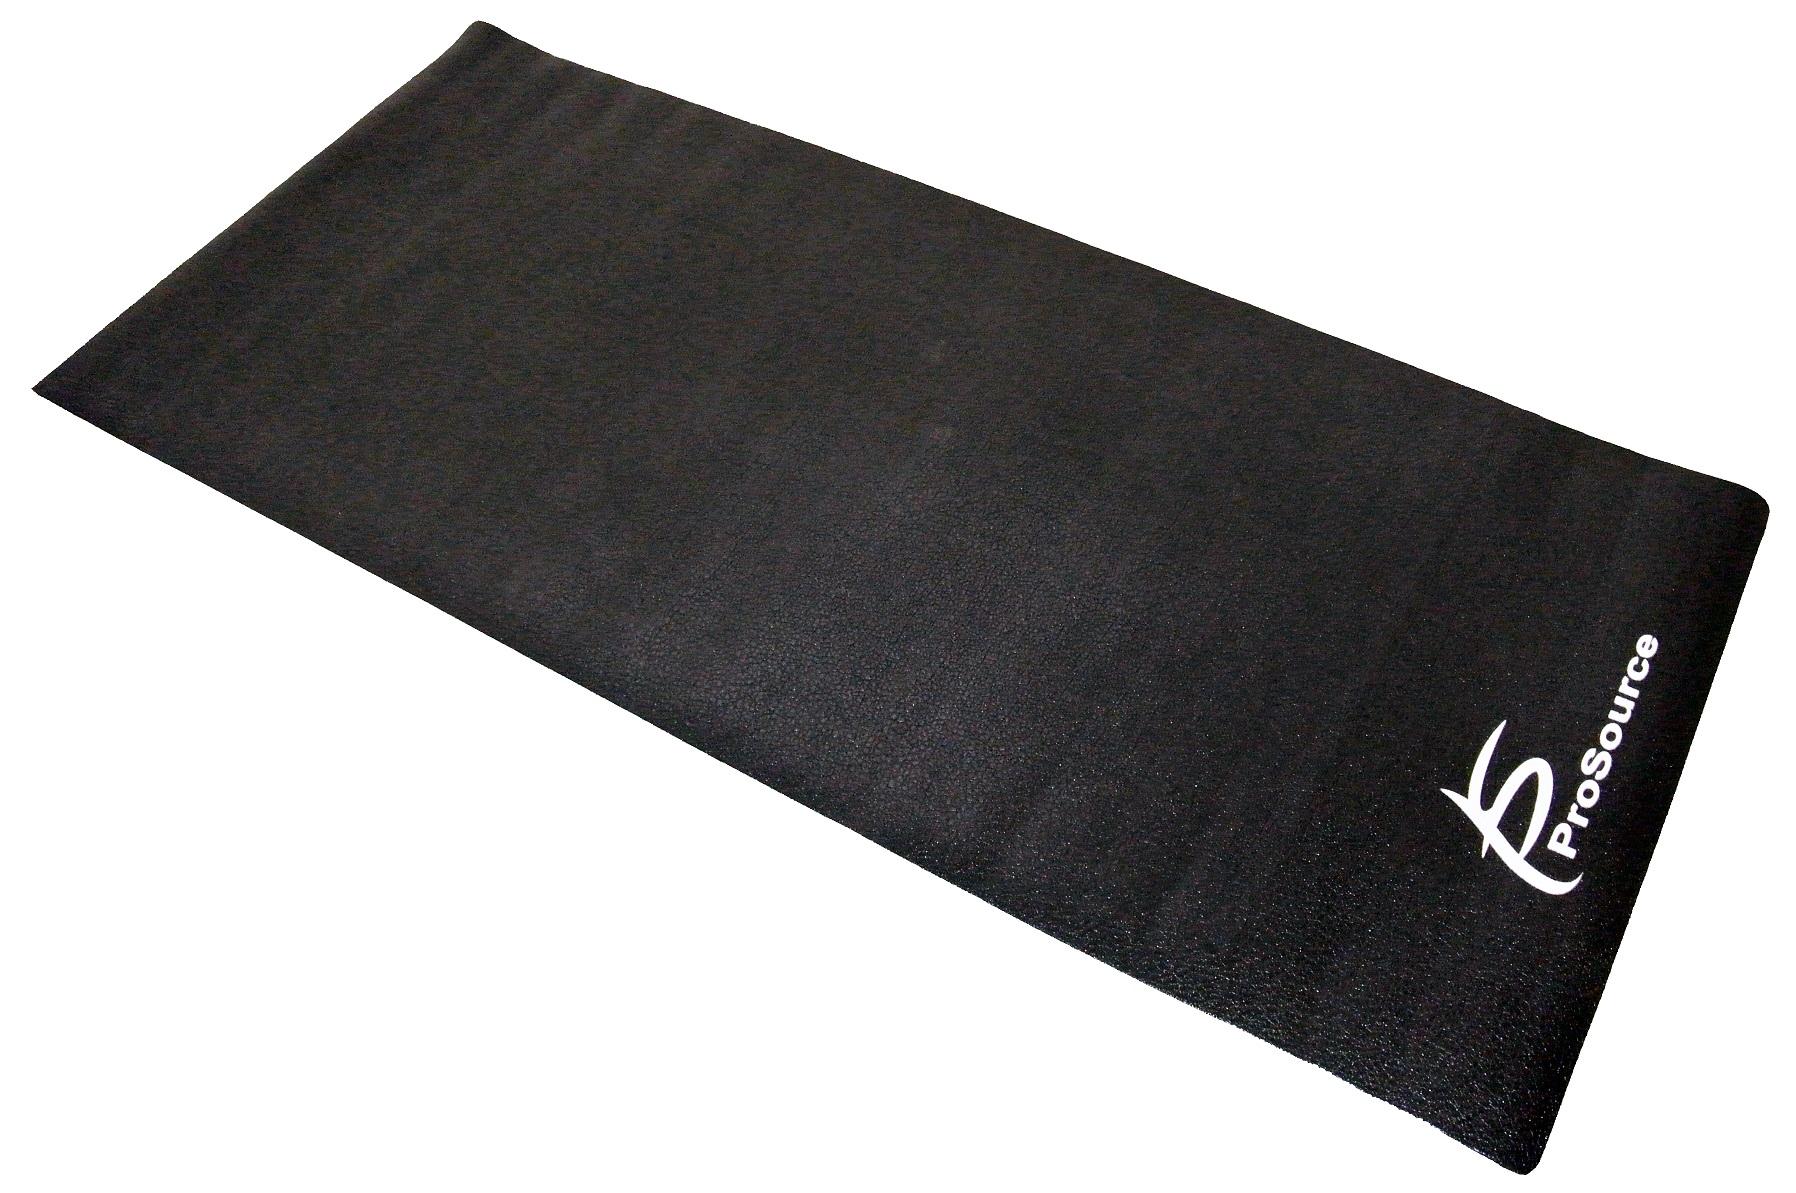 Prosource Pvc Floor Treadmill Mat For Elliptical Bike Gym